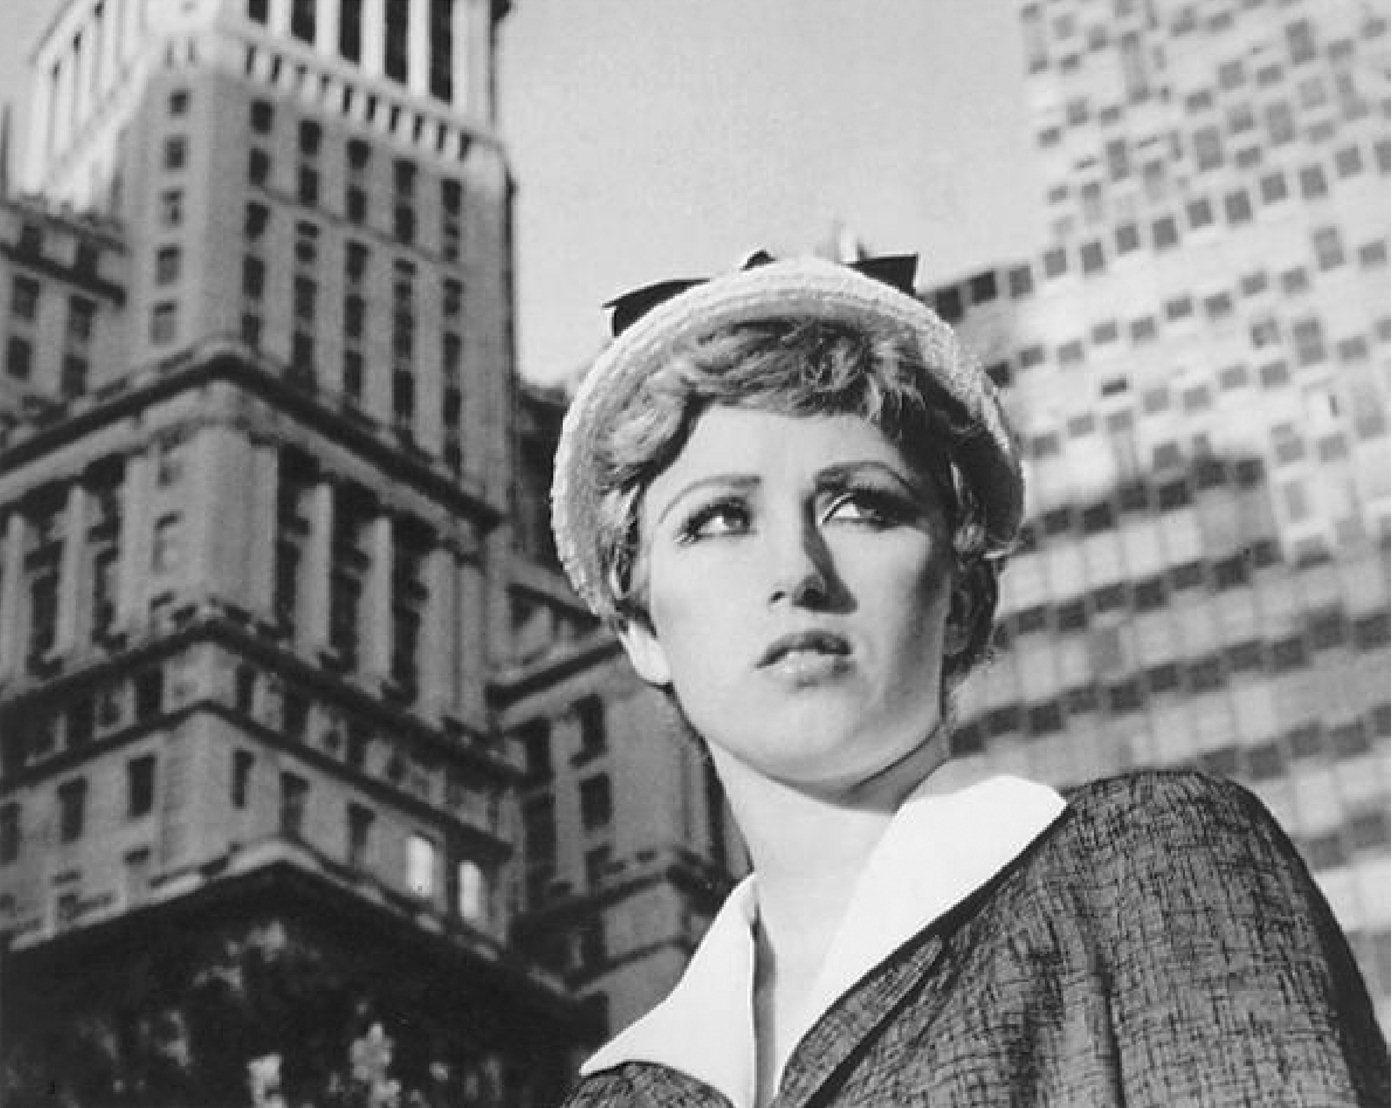 Cindy Sherman: Untitled Film Still #21, 1978